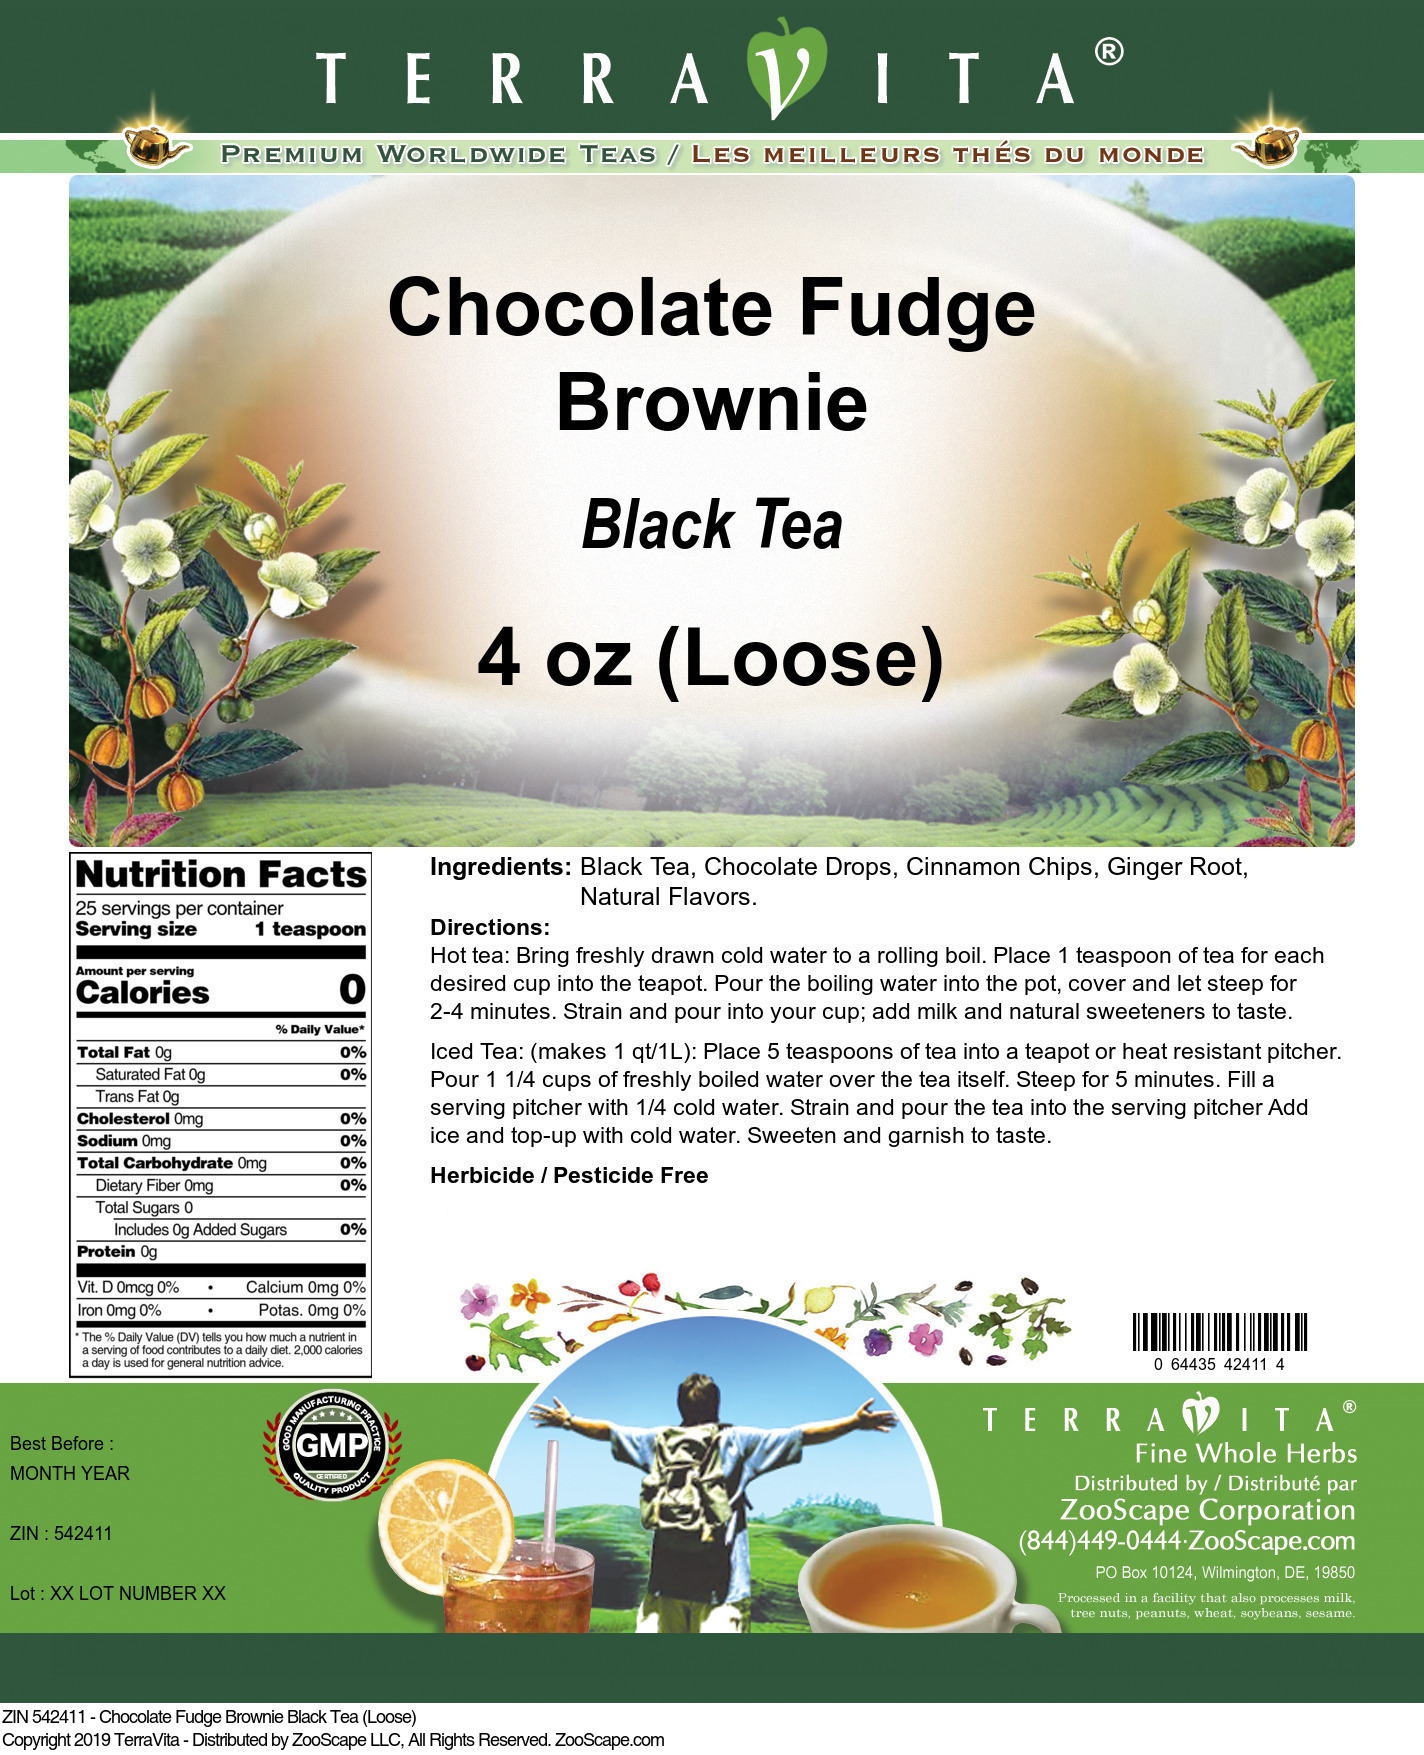 Chocolate Fudge Brownie Black Tea